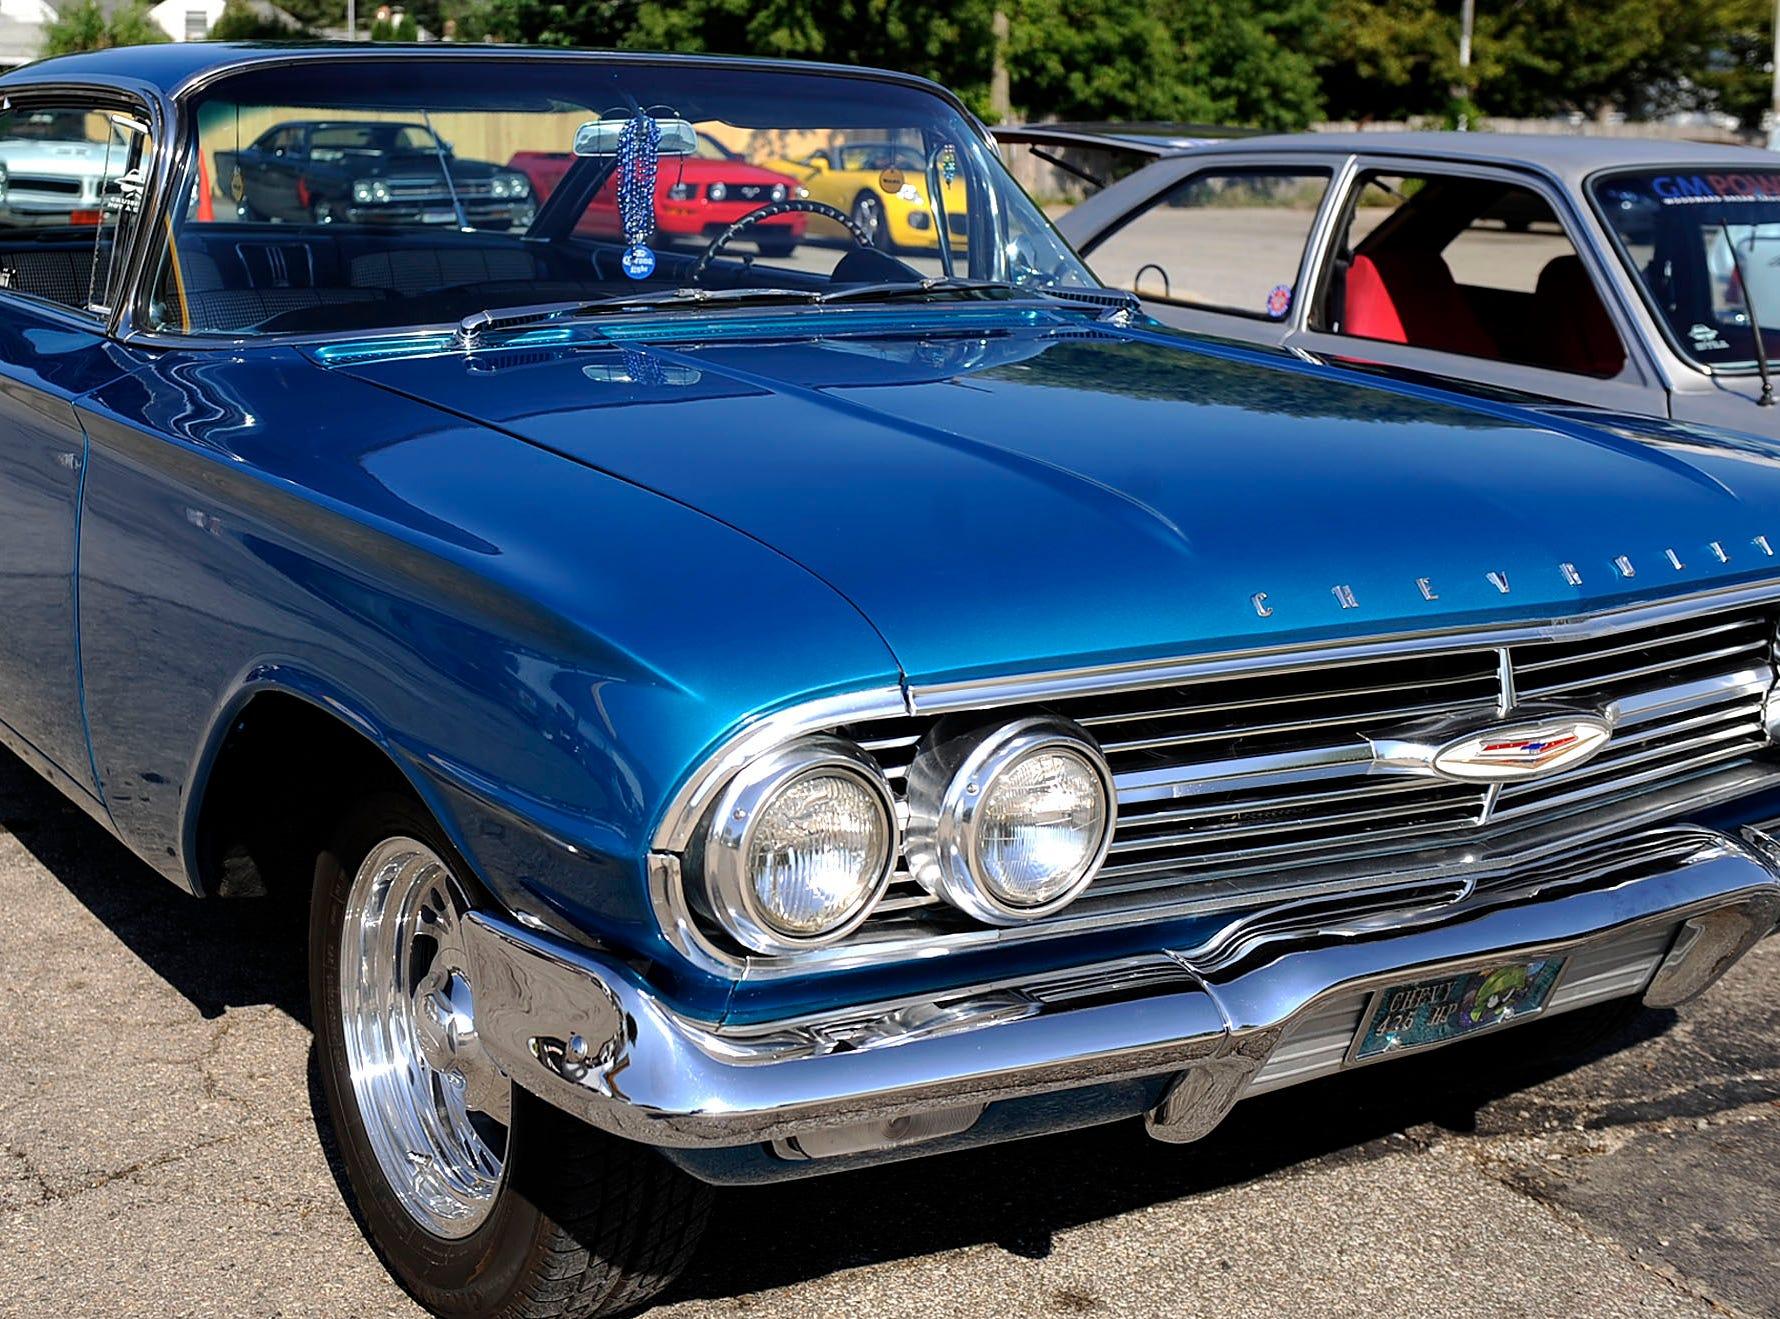 A 1960 Chevy Impala owned by Jay Harbin of Berkley.